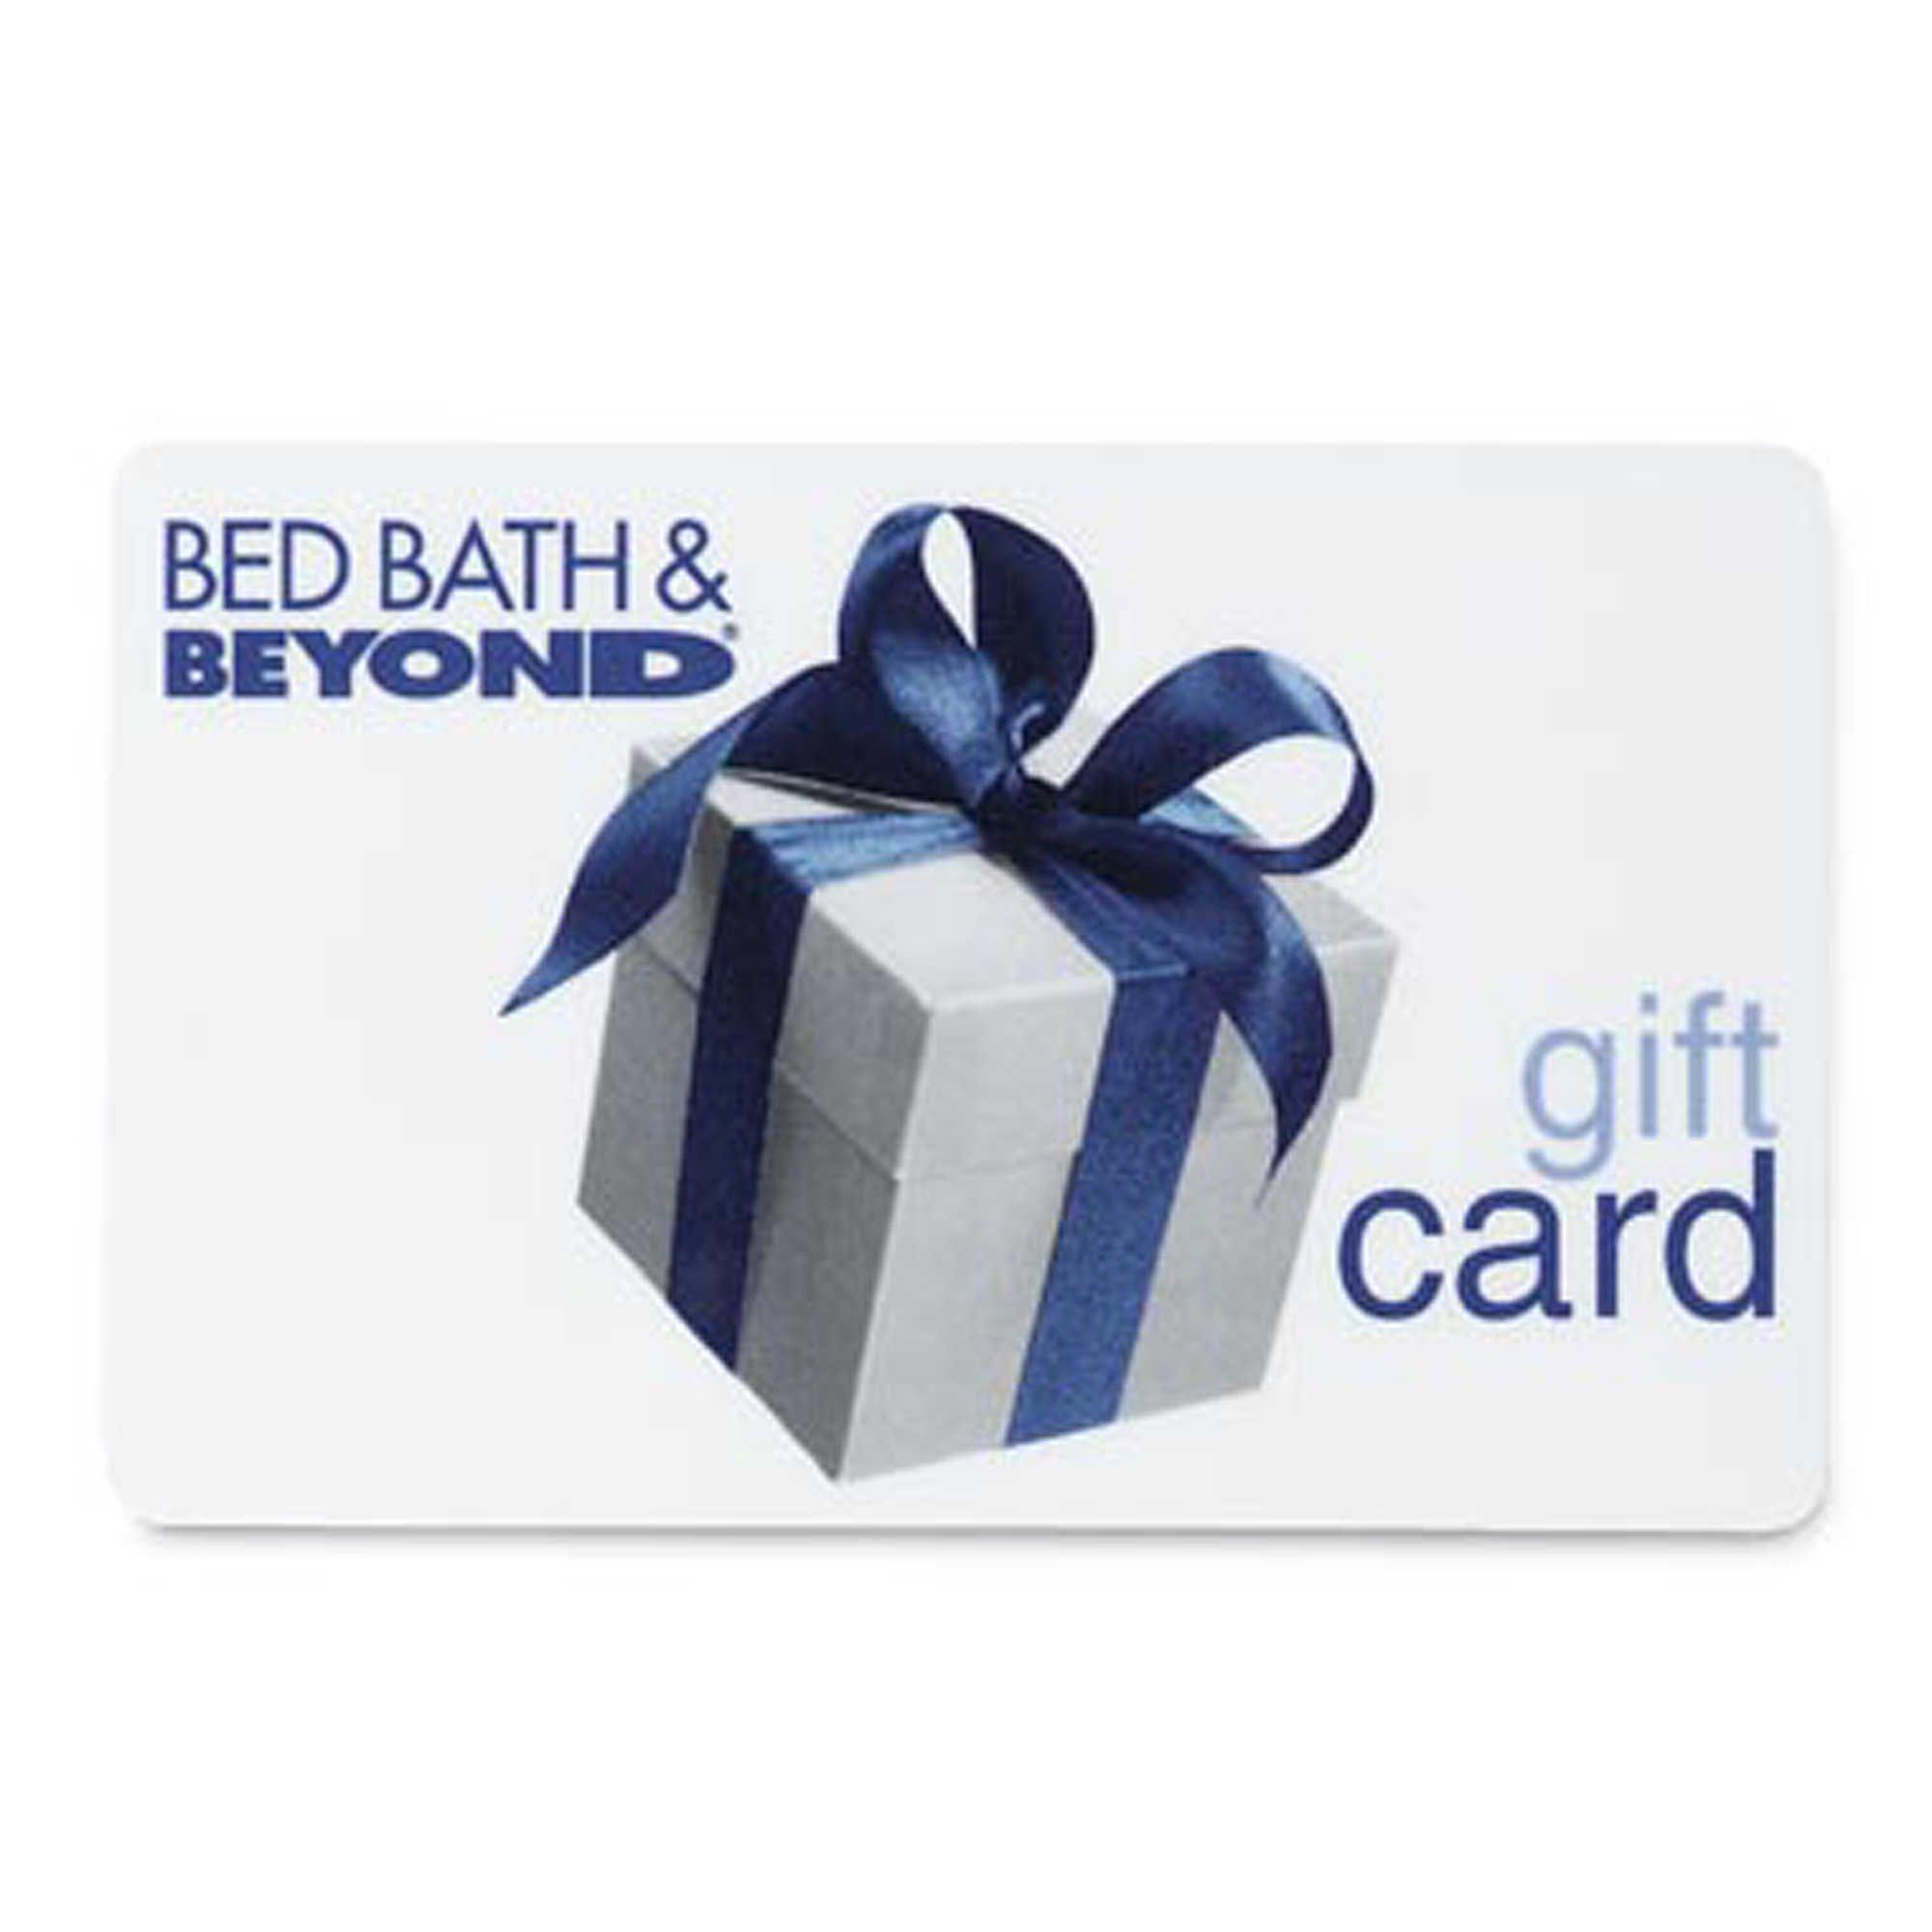 bed bath beyond canada gift card balance